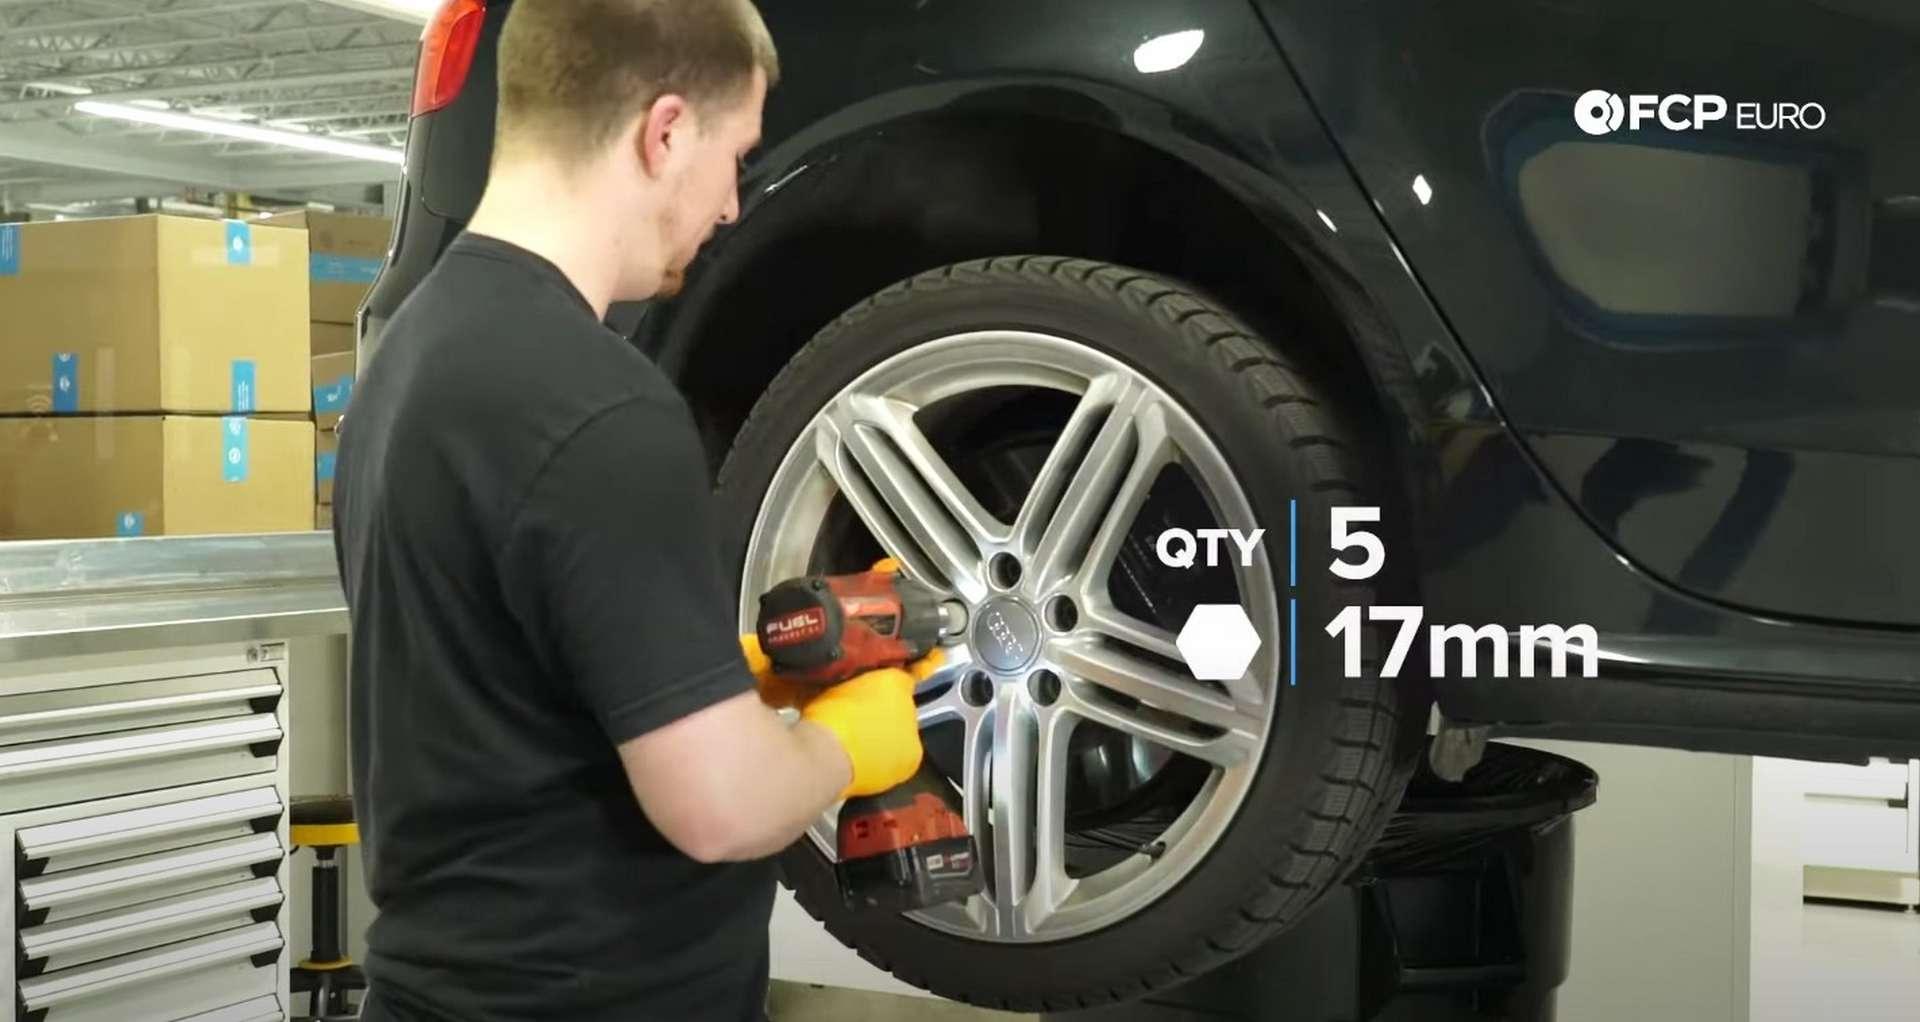 DIY Audi B8 S4 Rear Brake Service removing the wheel